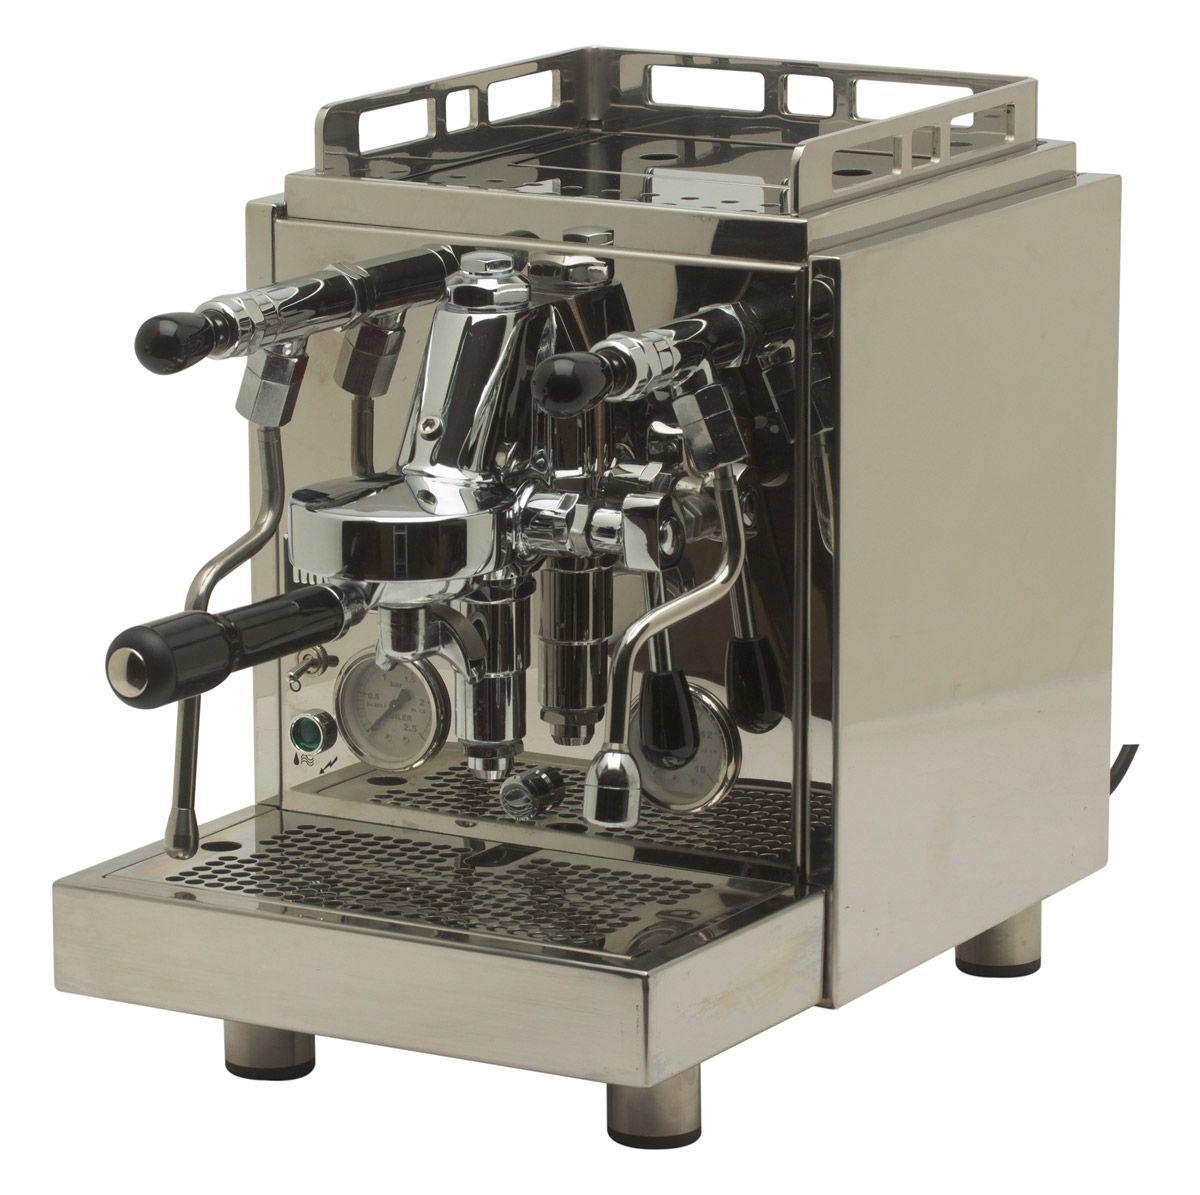 espressomachine, isomac, pro, 6.1, rotatiepomp, 74670